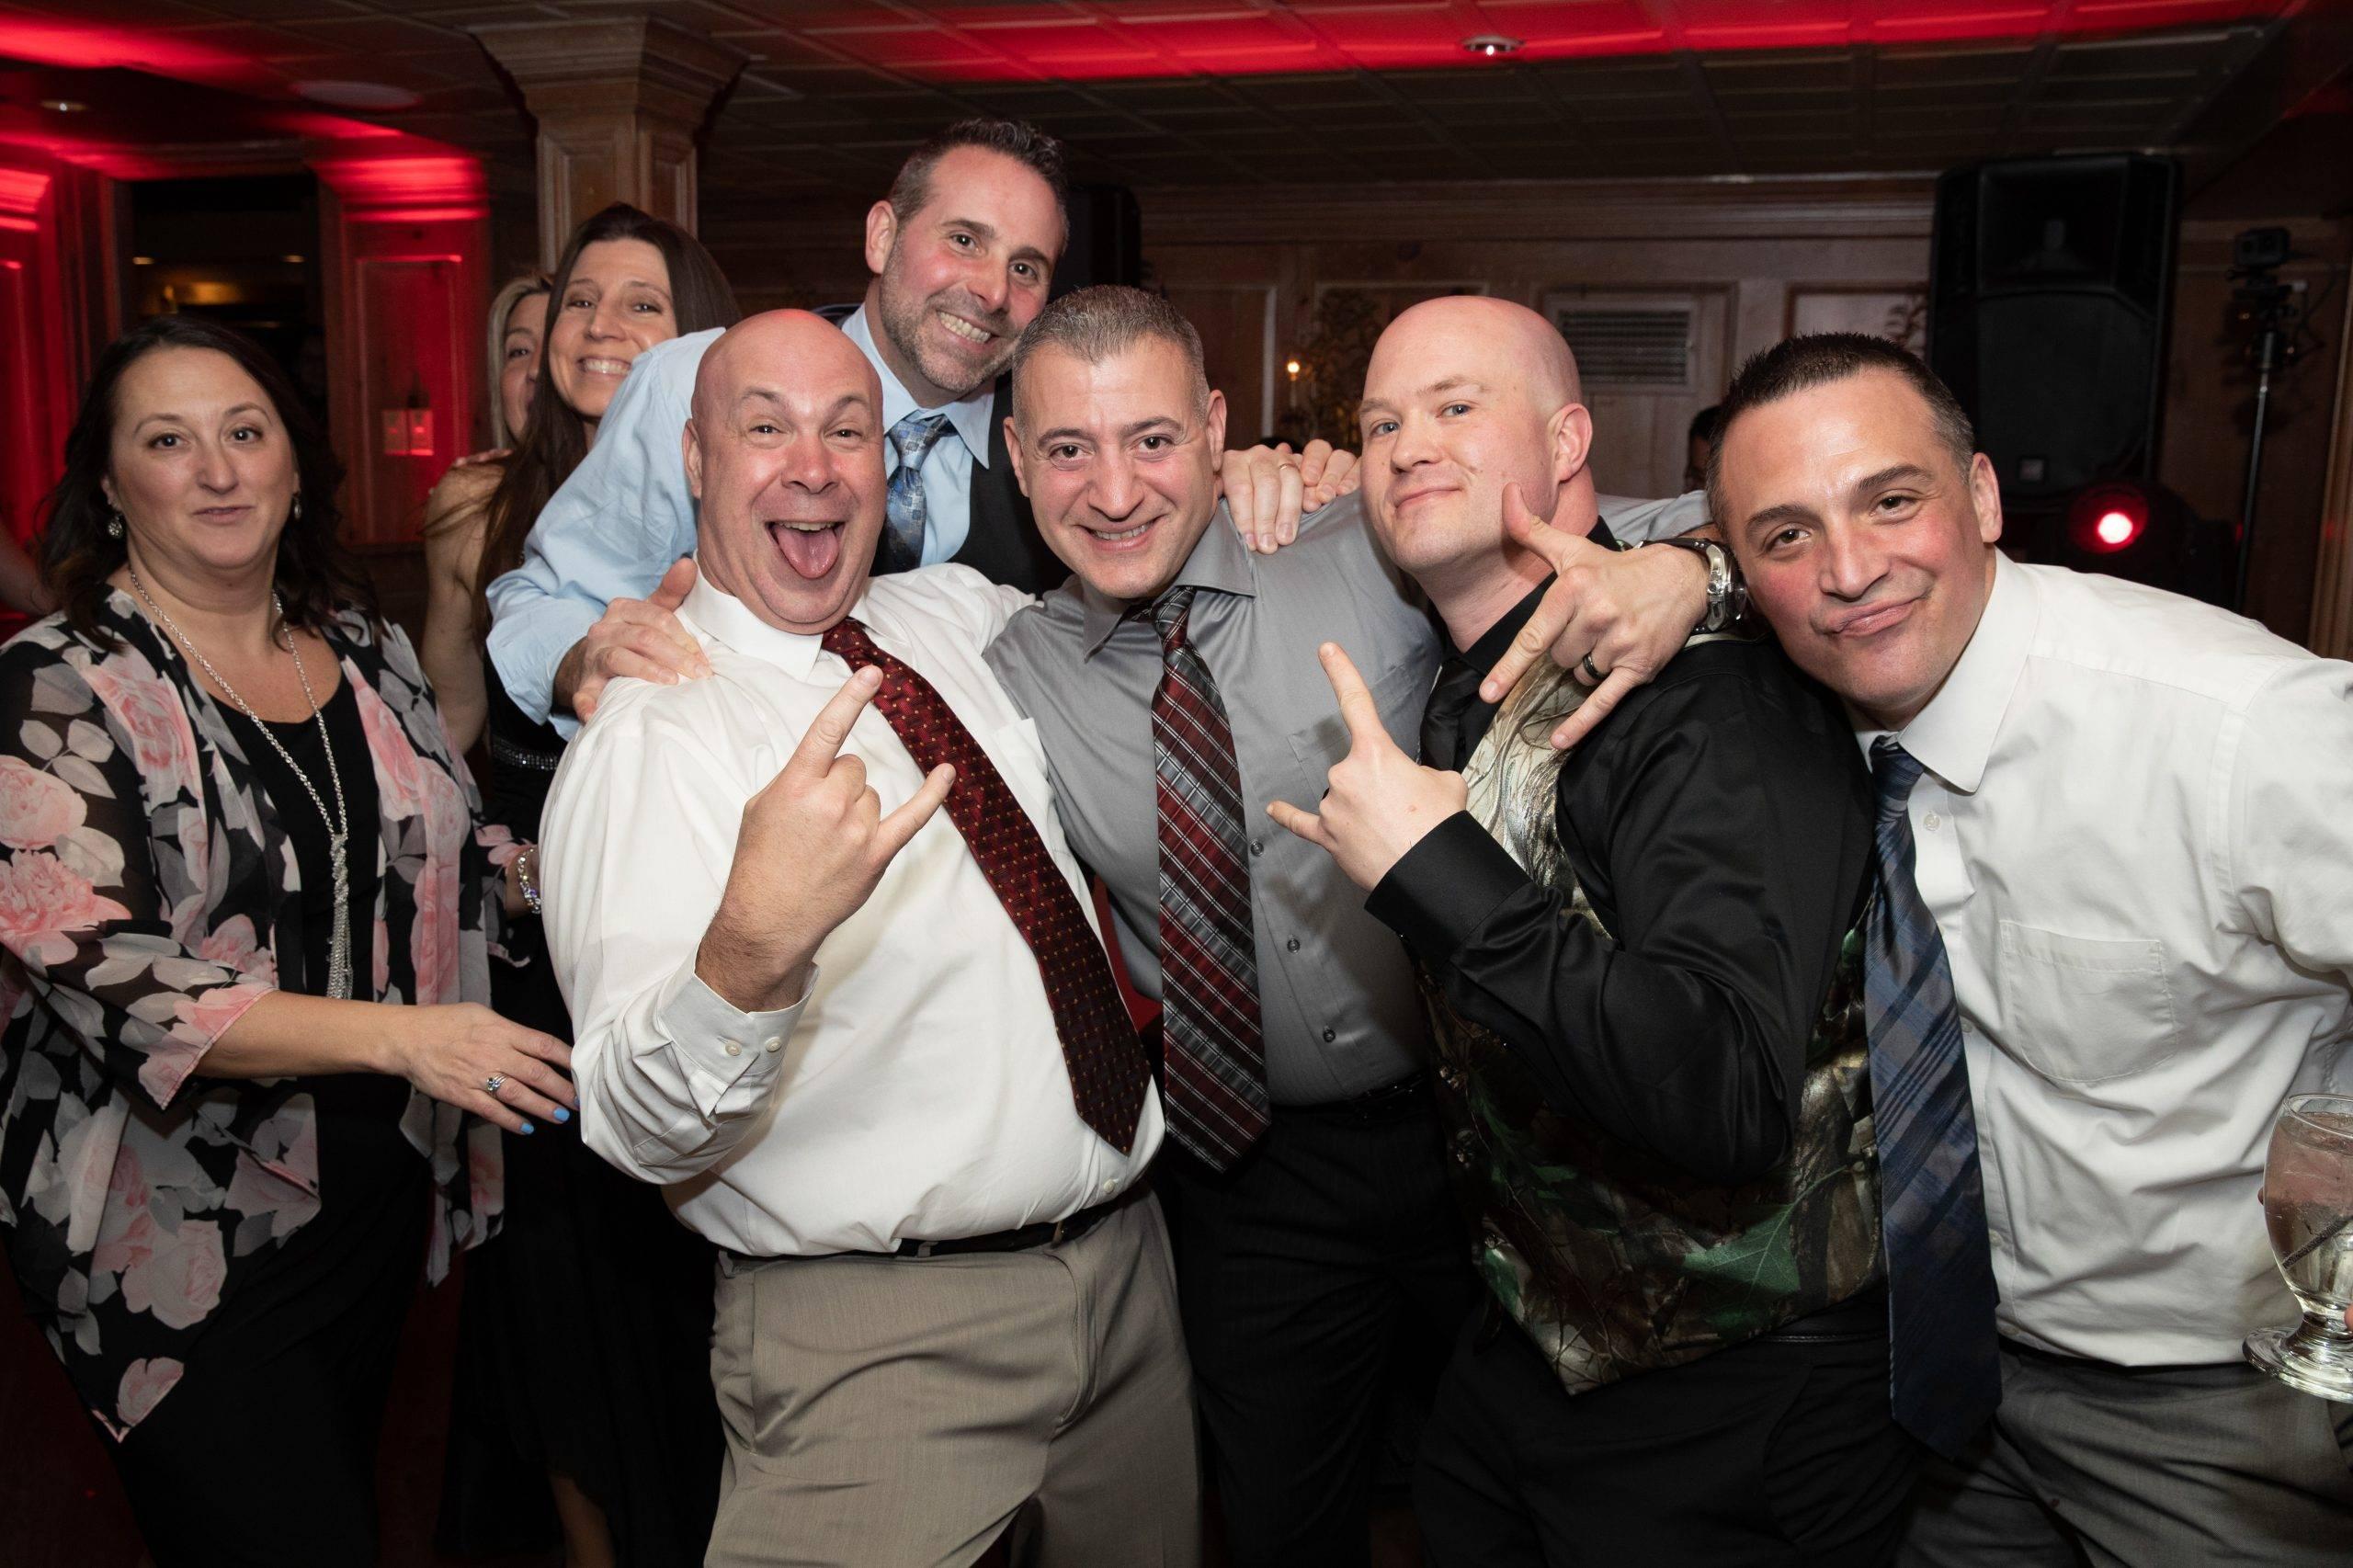 Olde Mill Inn wedding guests having fun